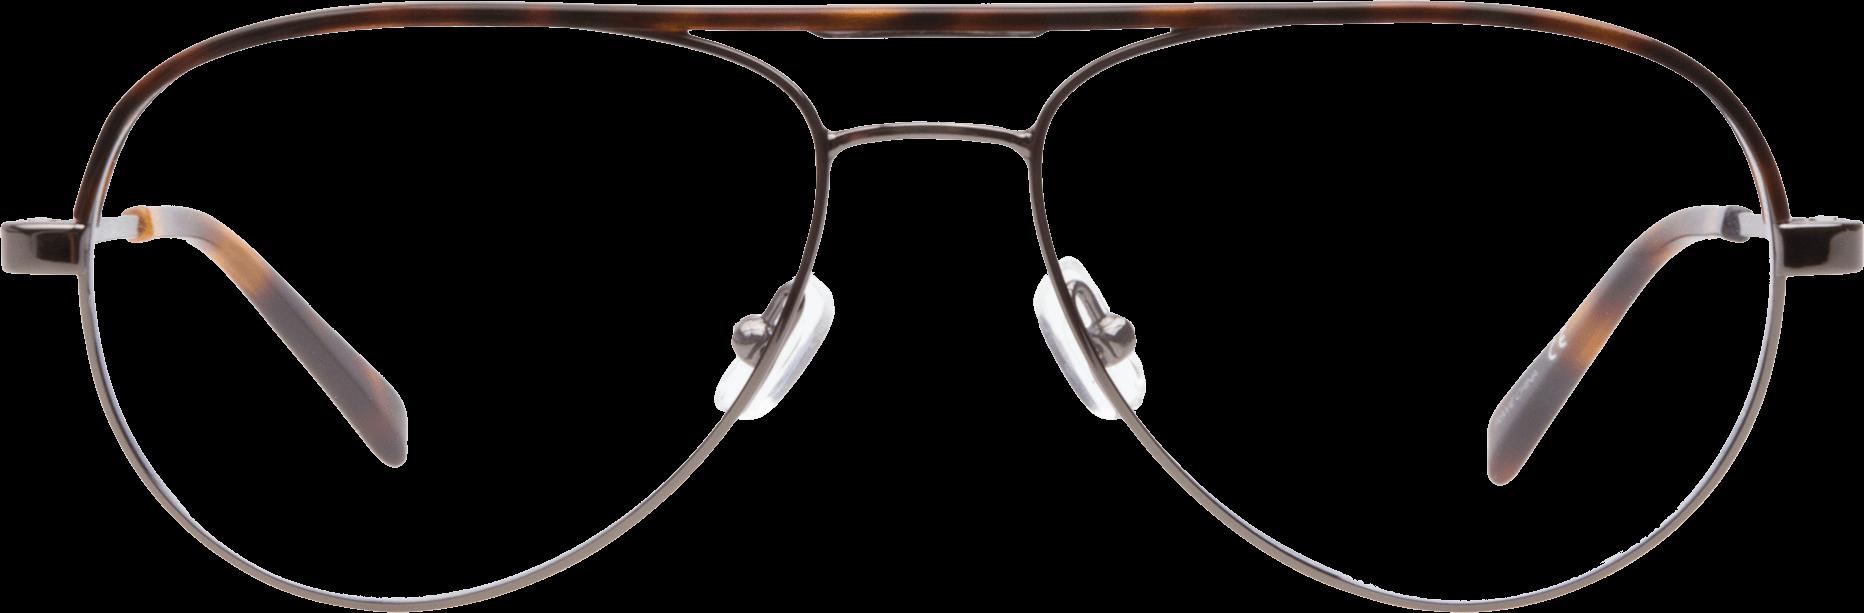 clip art transparent stock Clip glasses glass table. Frames png art transparent